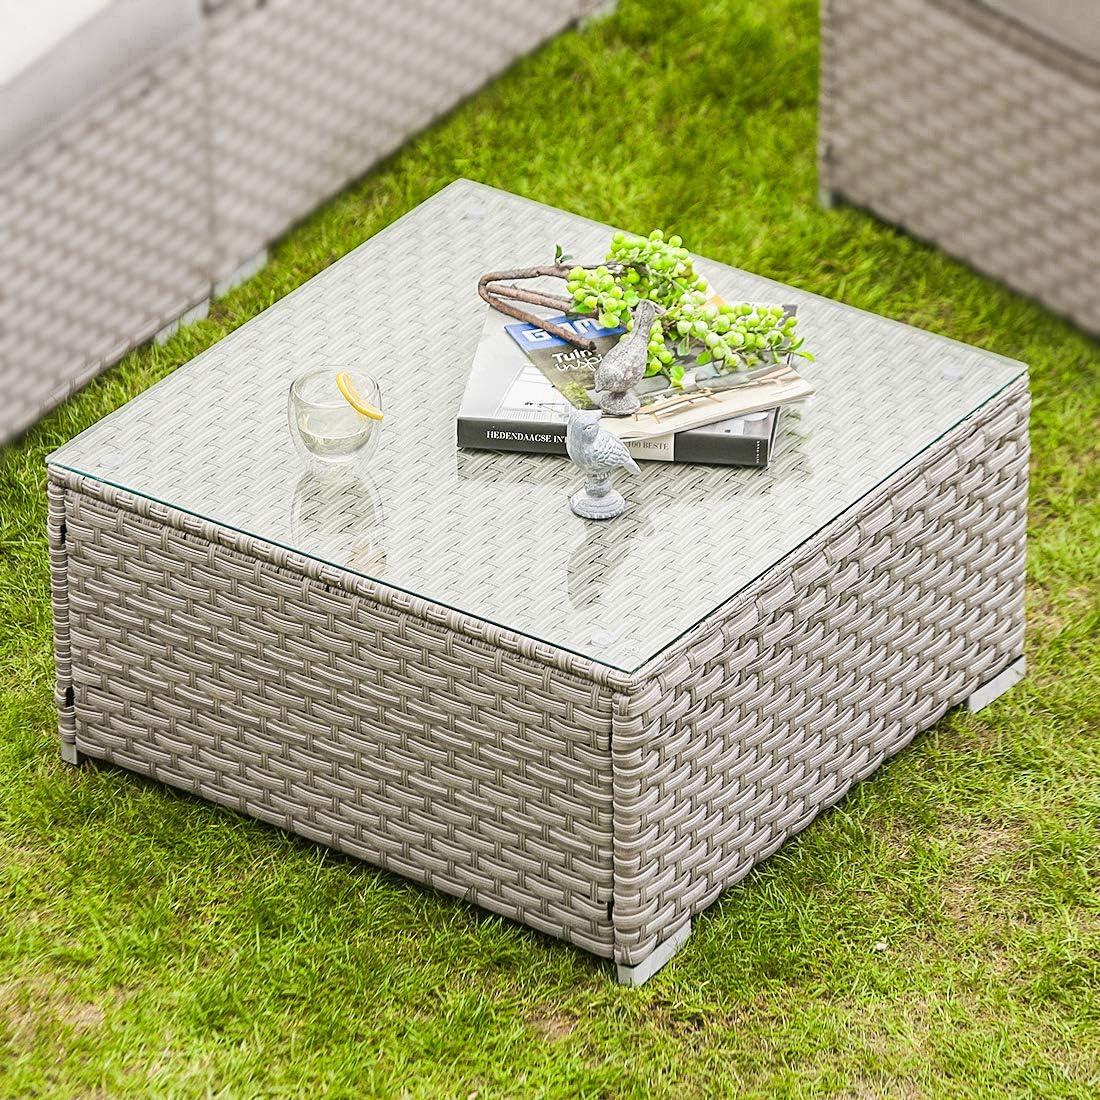 COSIEST In stock Outdoor Furniture Warm Portland Mall Gray Wicker Glass-Top Coffee Tabl